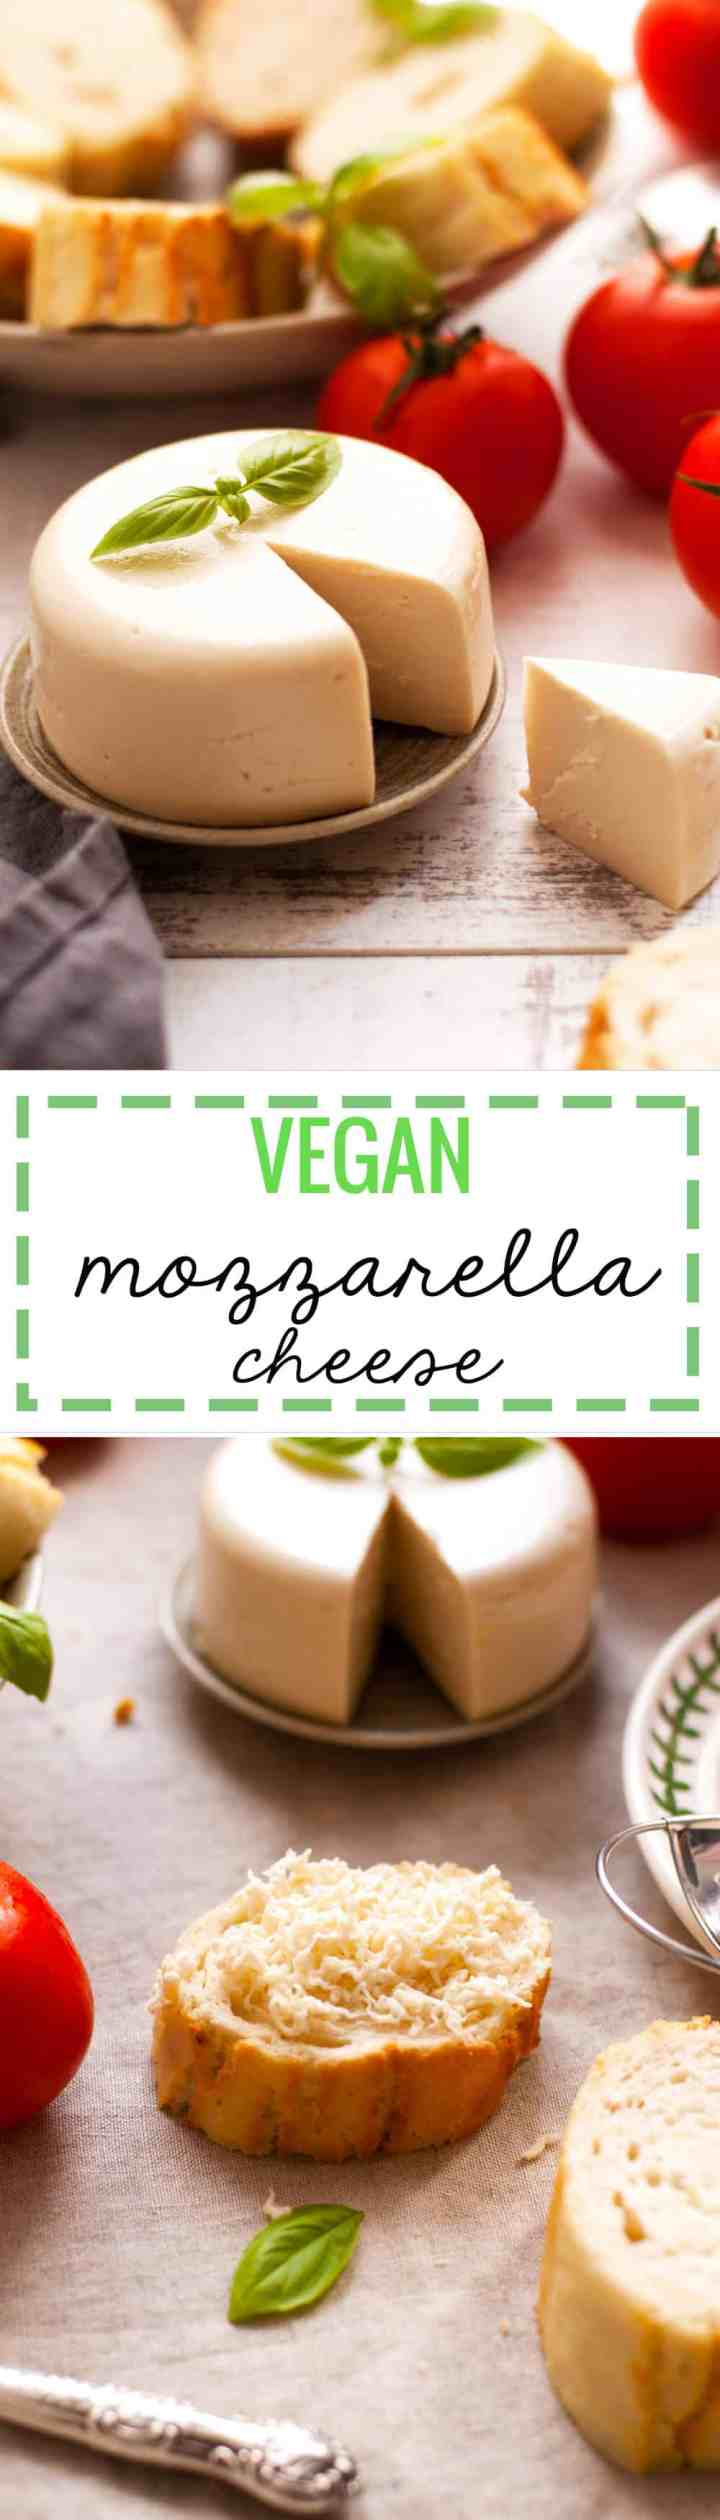 Vegan-Mozzarella-Cheese-Pinterest-Image